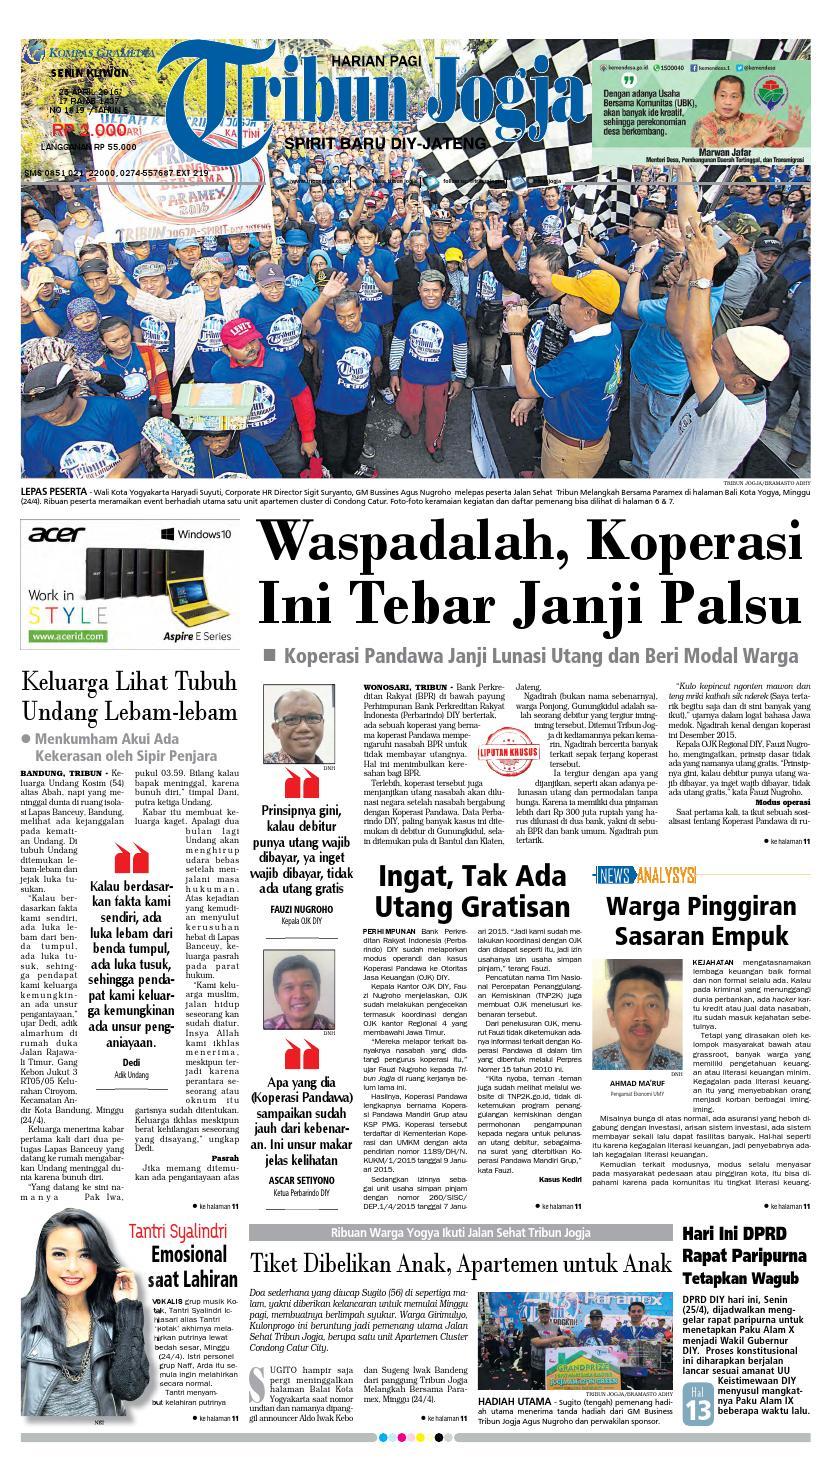 Tribunjogja 25-04-2016 by tribun jogja - issuu 14113a7df8